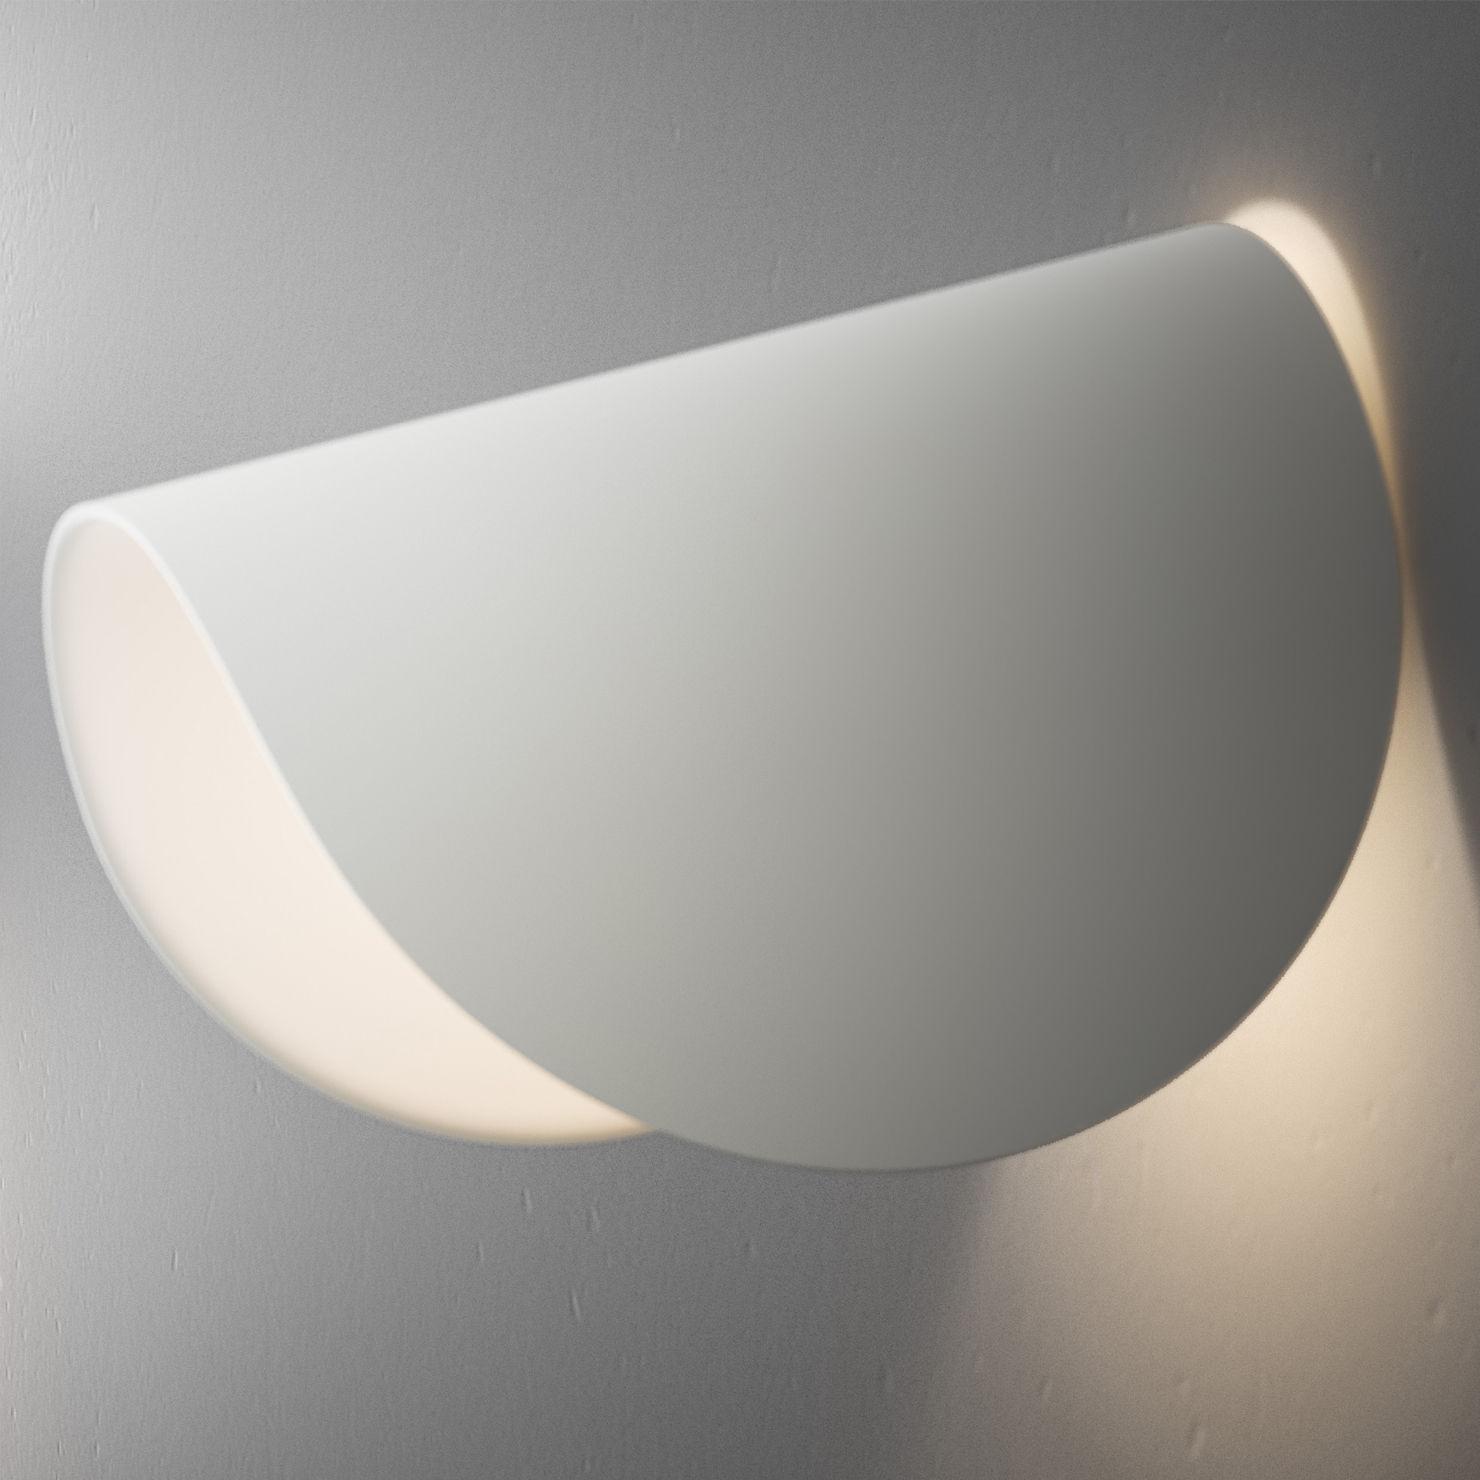 Applique IO LED  Orientable Blanc  Fontana Arte  Made In Design